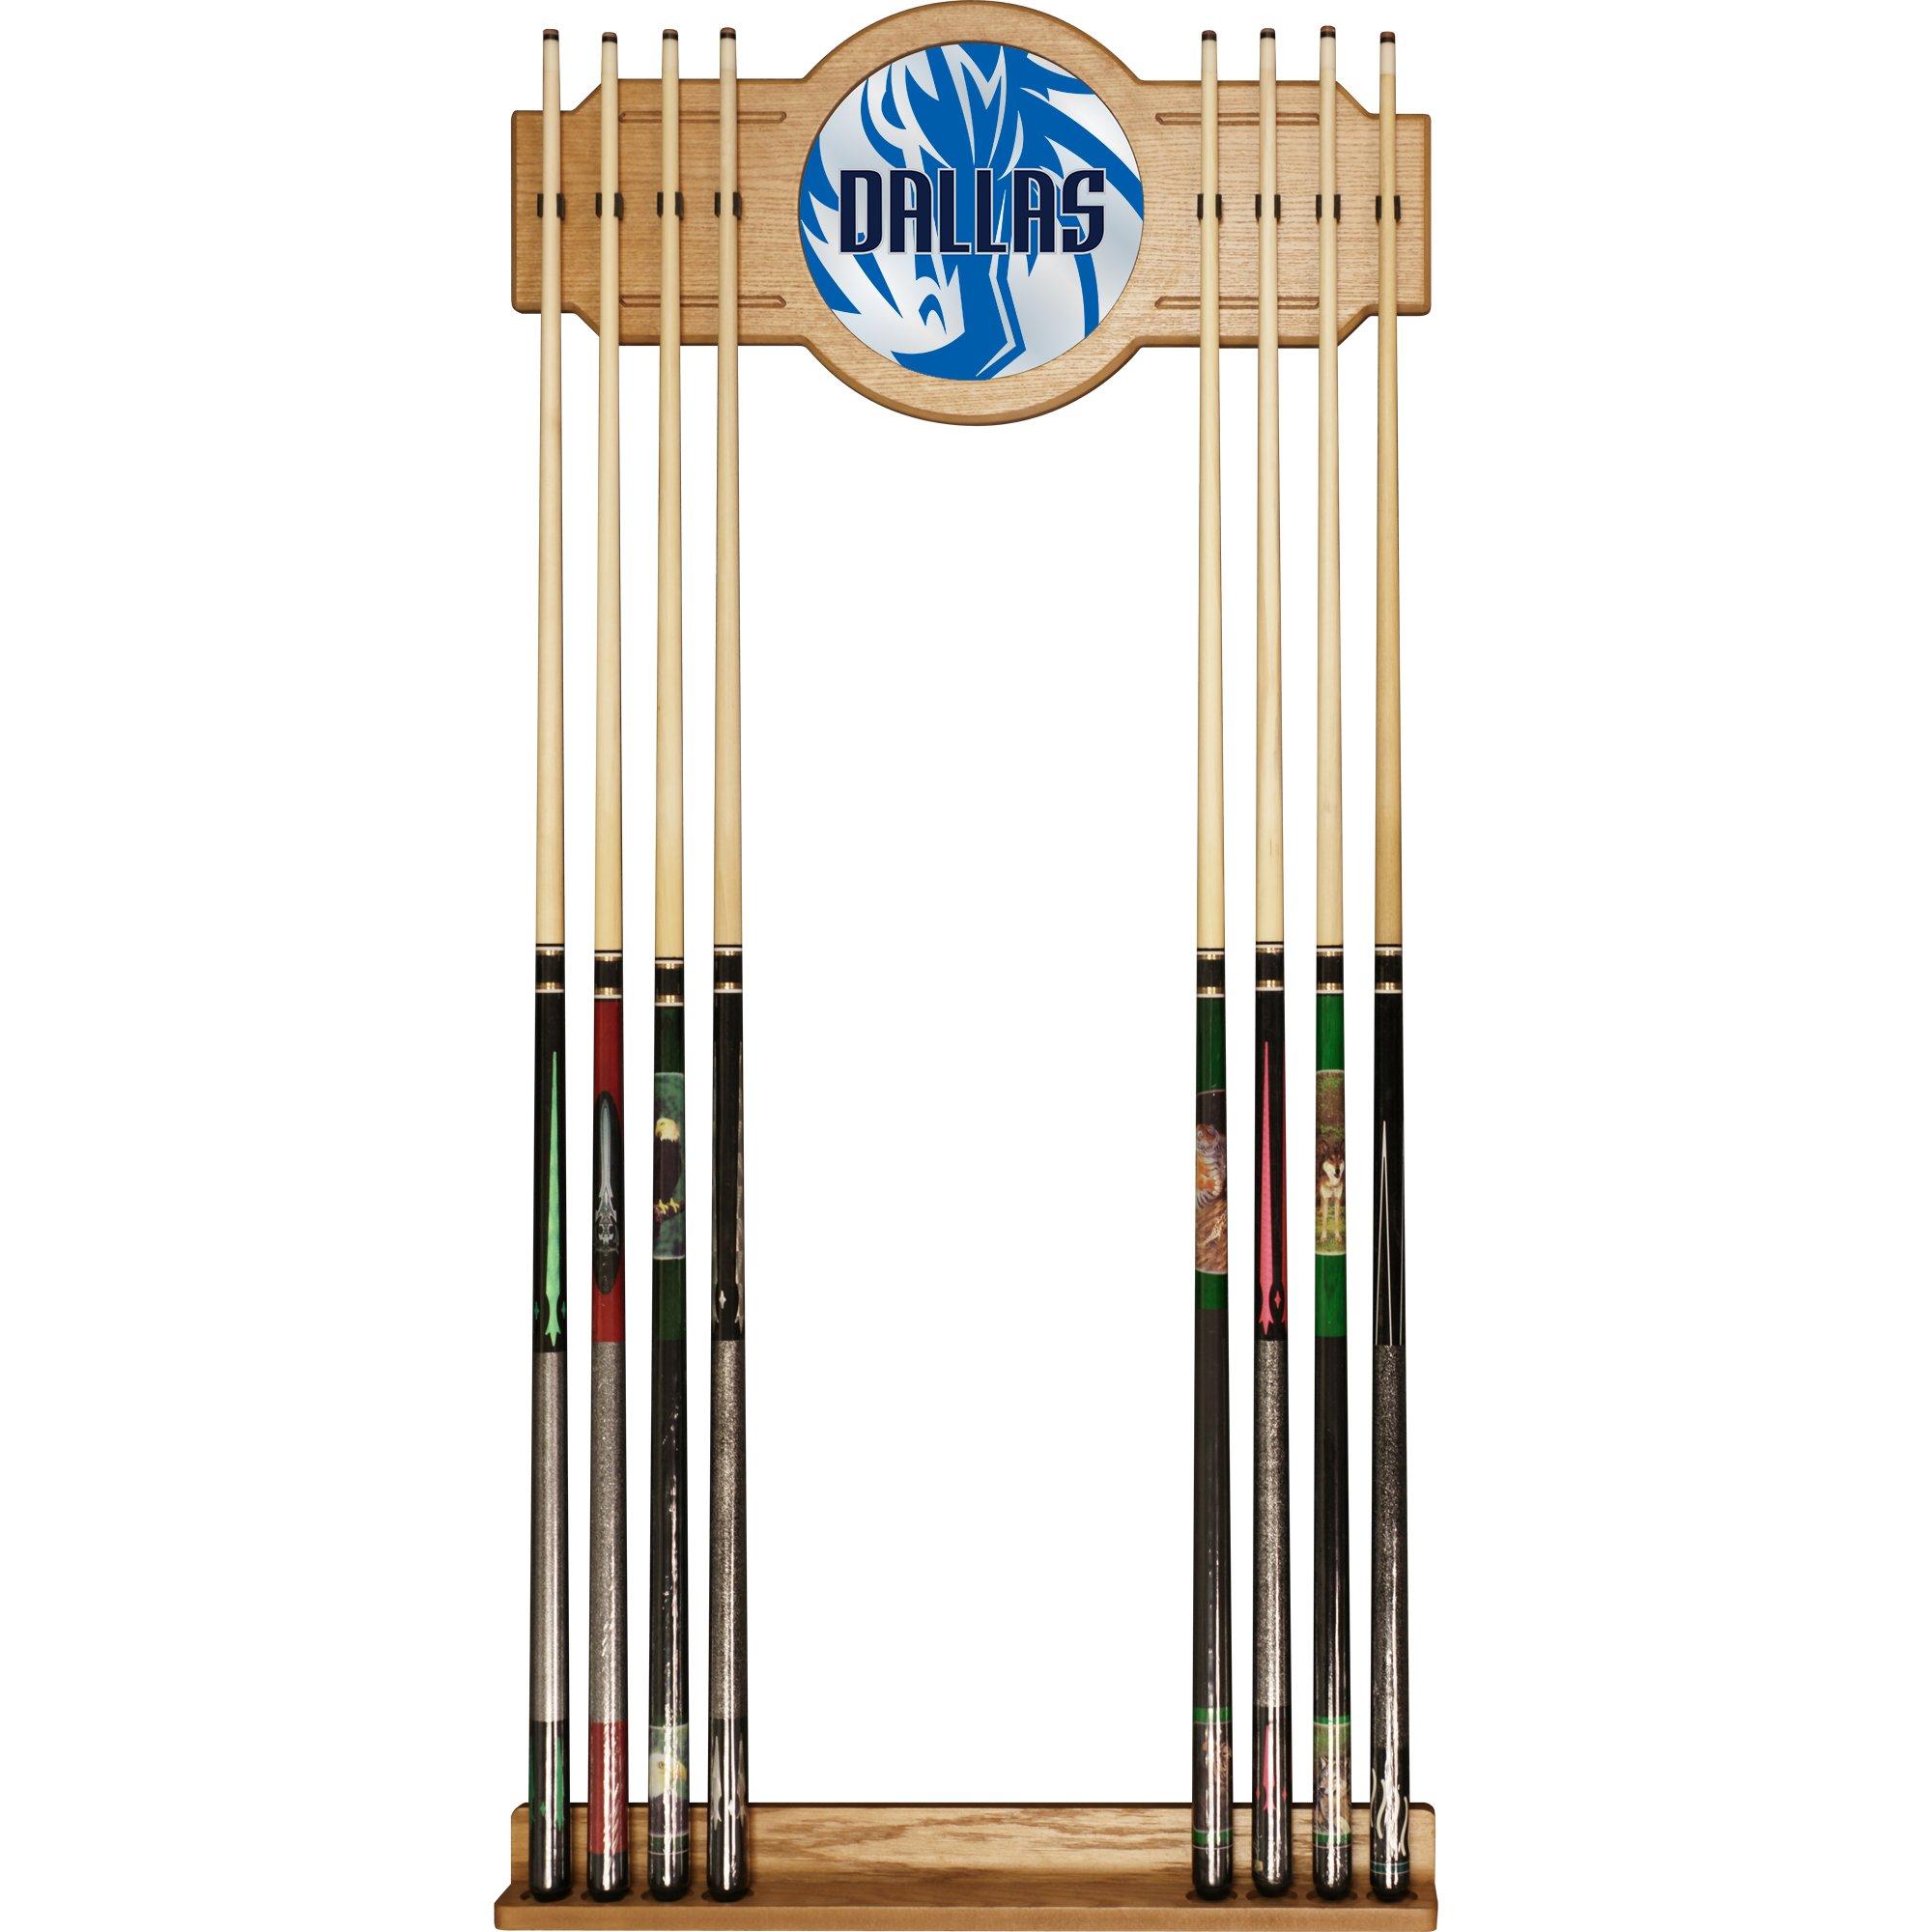 Trademark Gameroom NBA6000-DM2 NBA Cue Rack with Mirror - Fade - Dallas Mavericks by Trademark Global